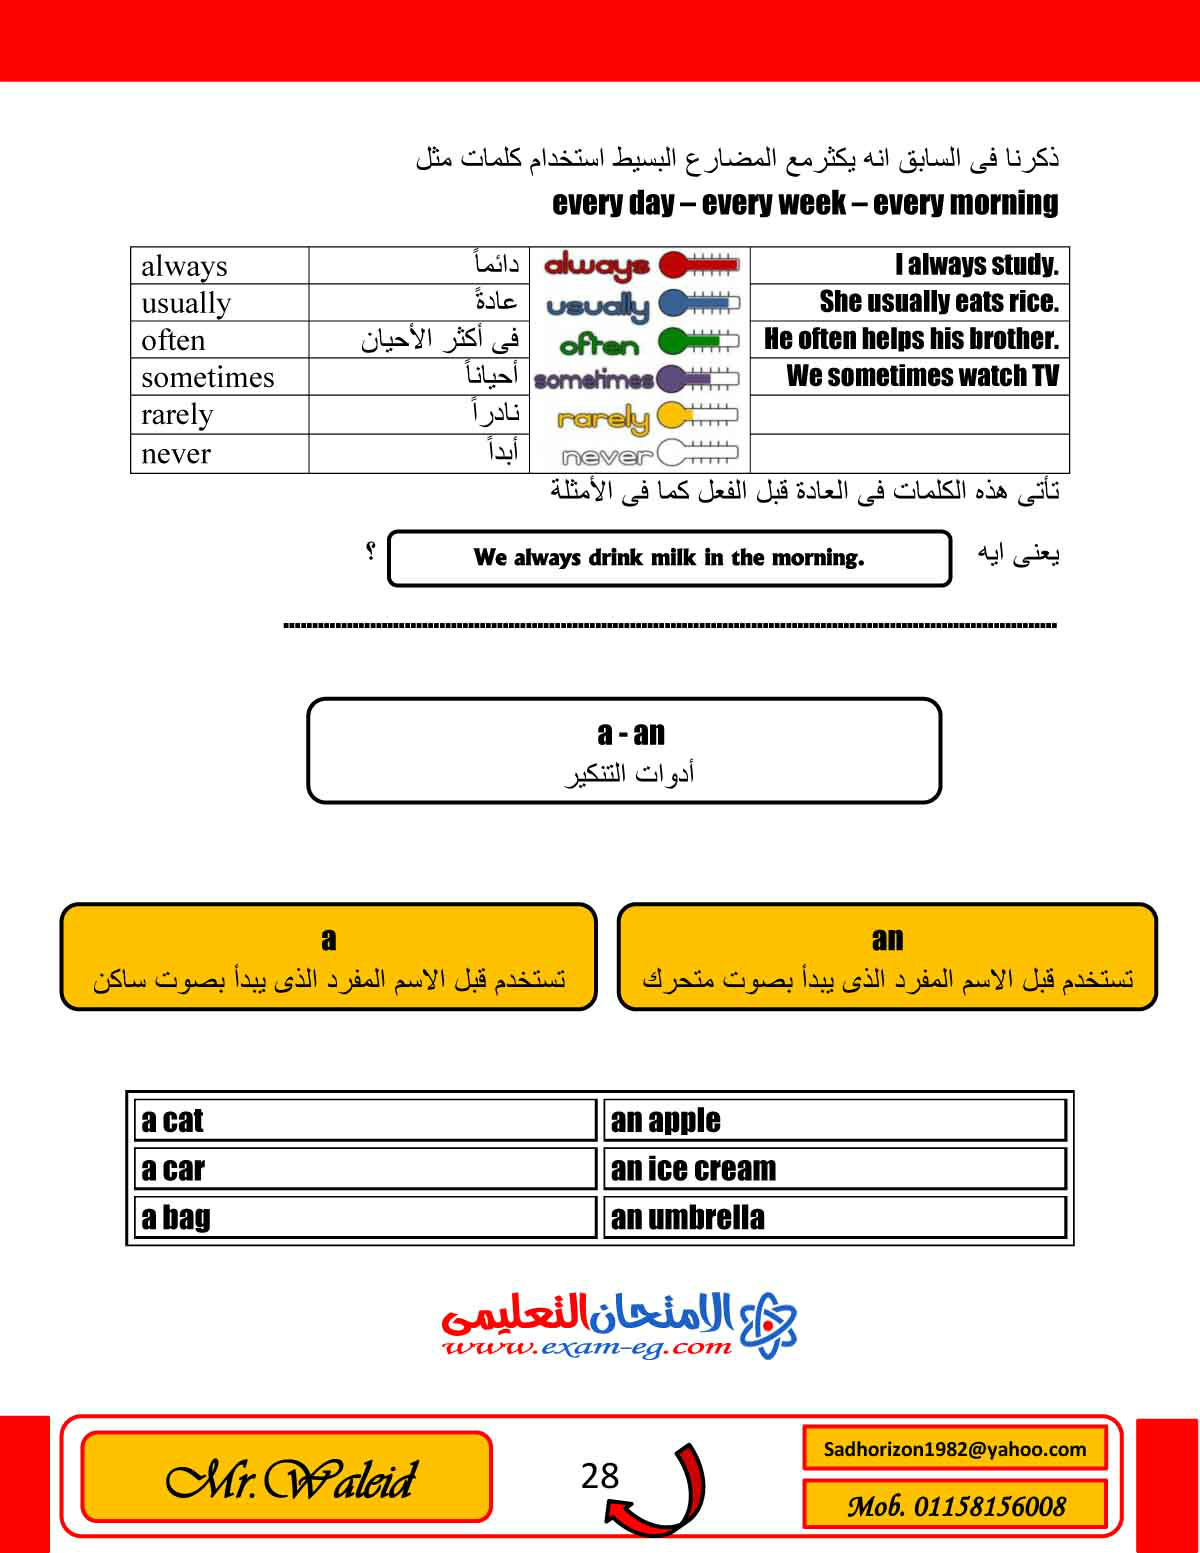 exam-eg.com_1449405428858.jpg